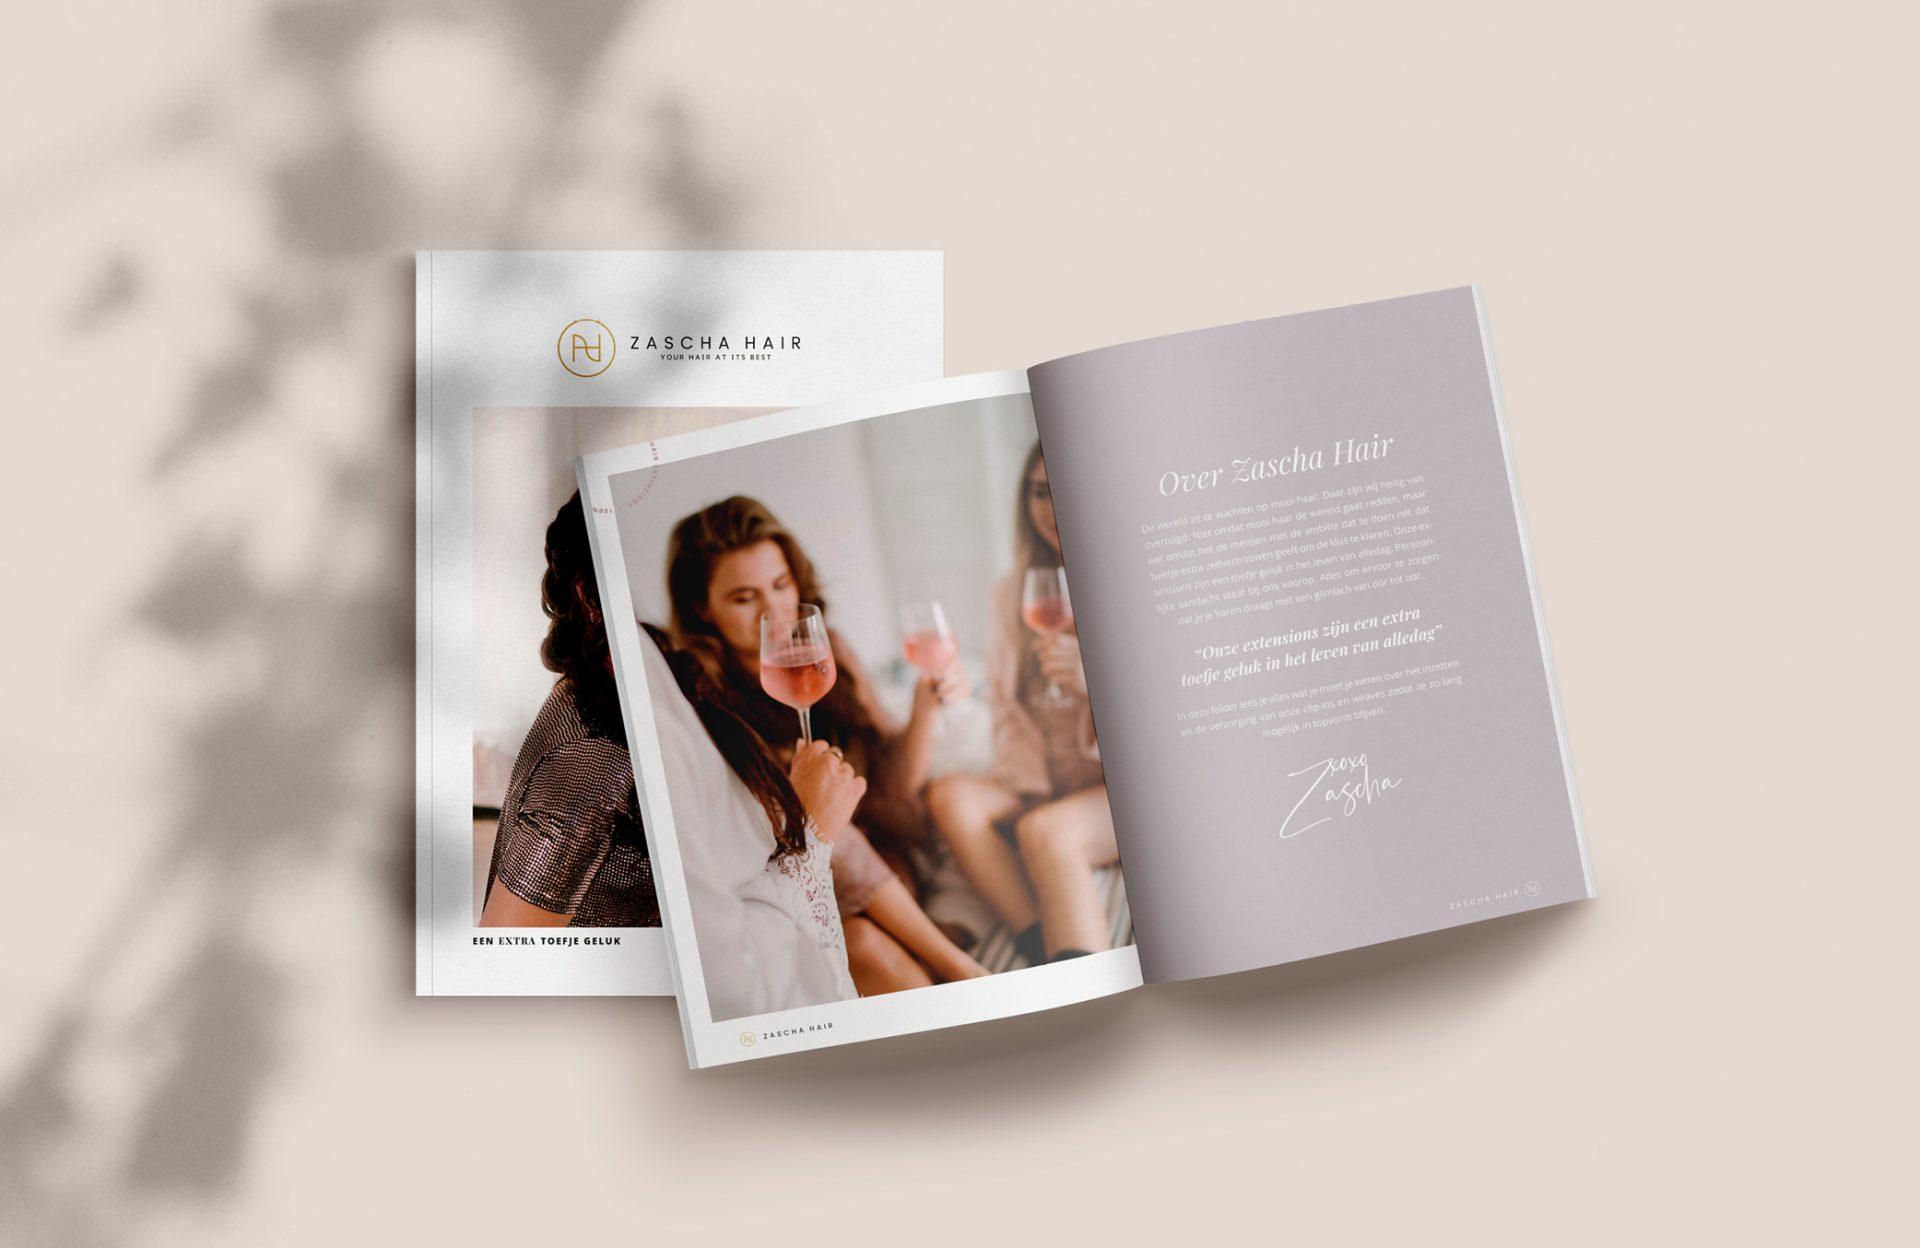 Studio Marly - Creative Agency - Zascha Hair